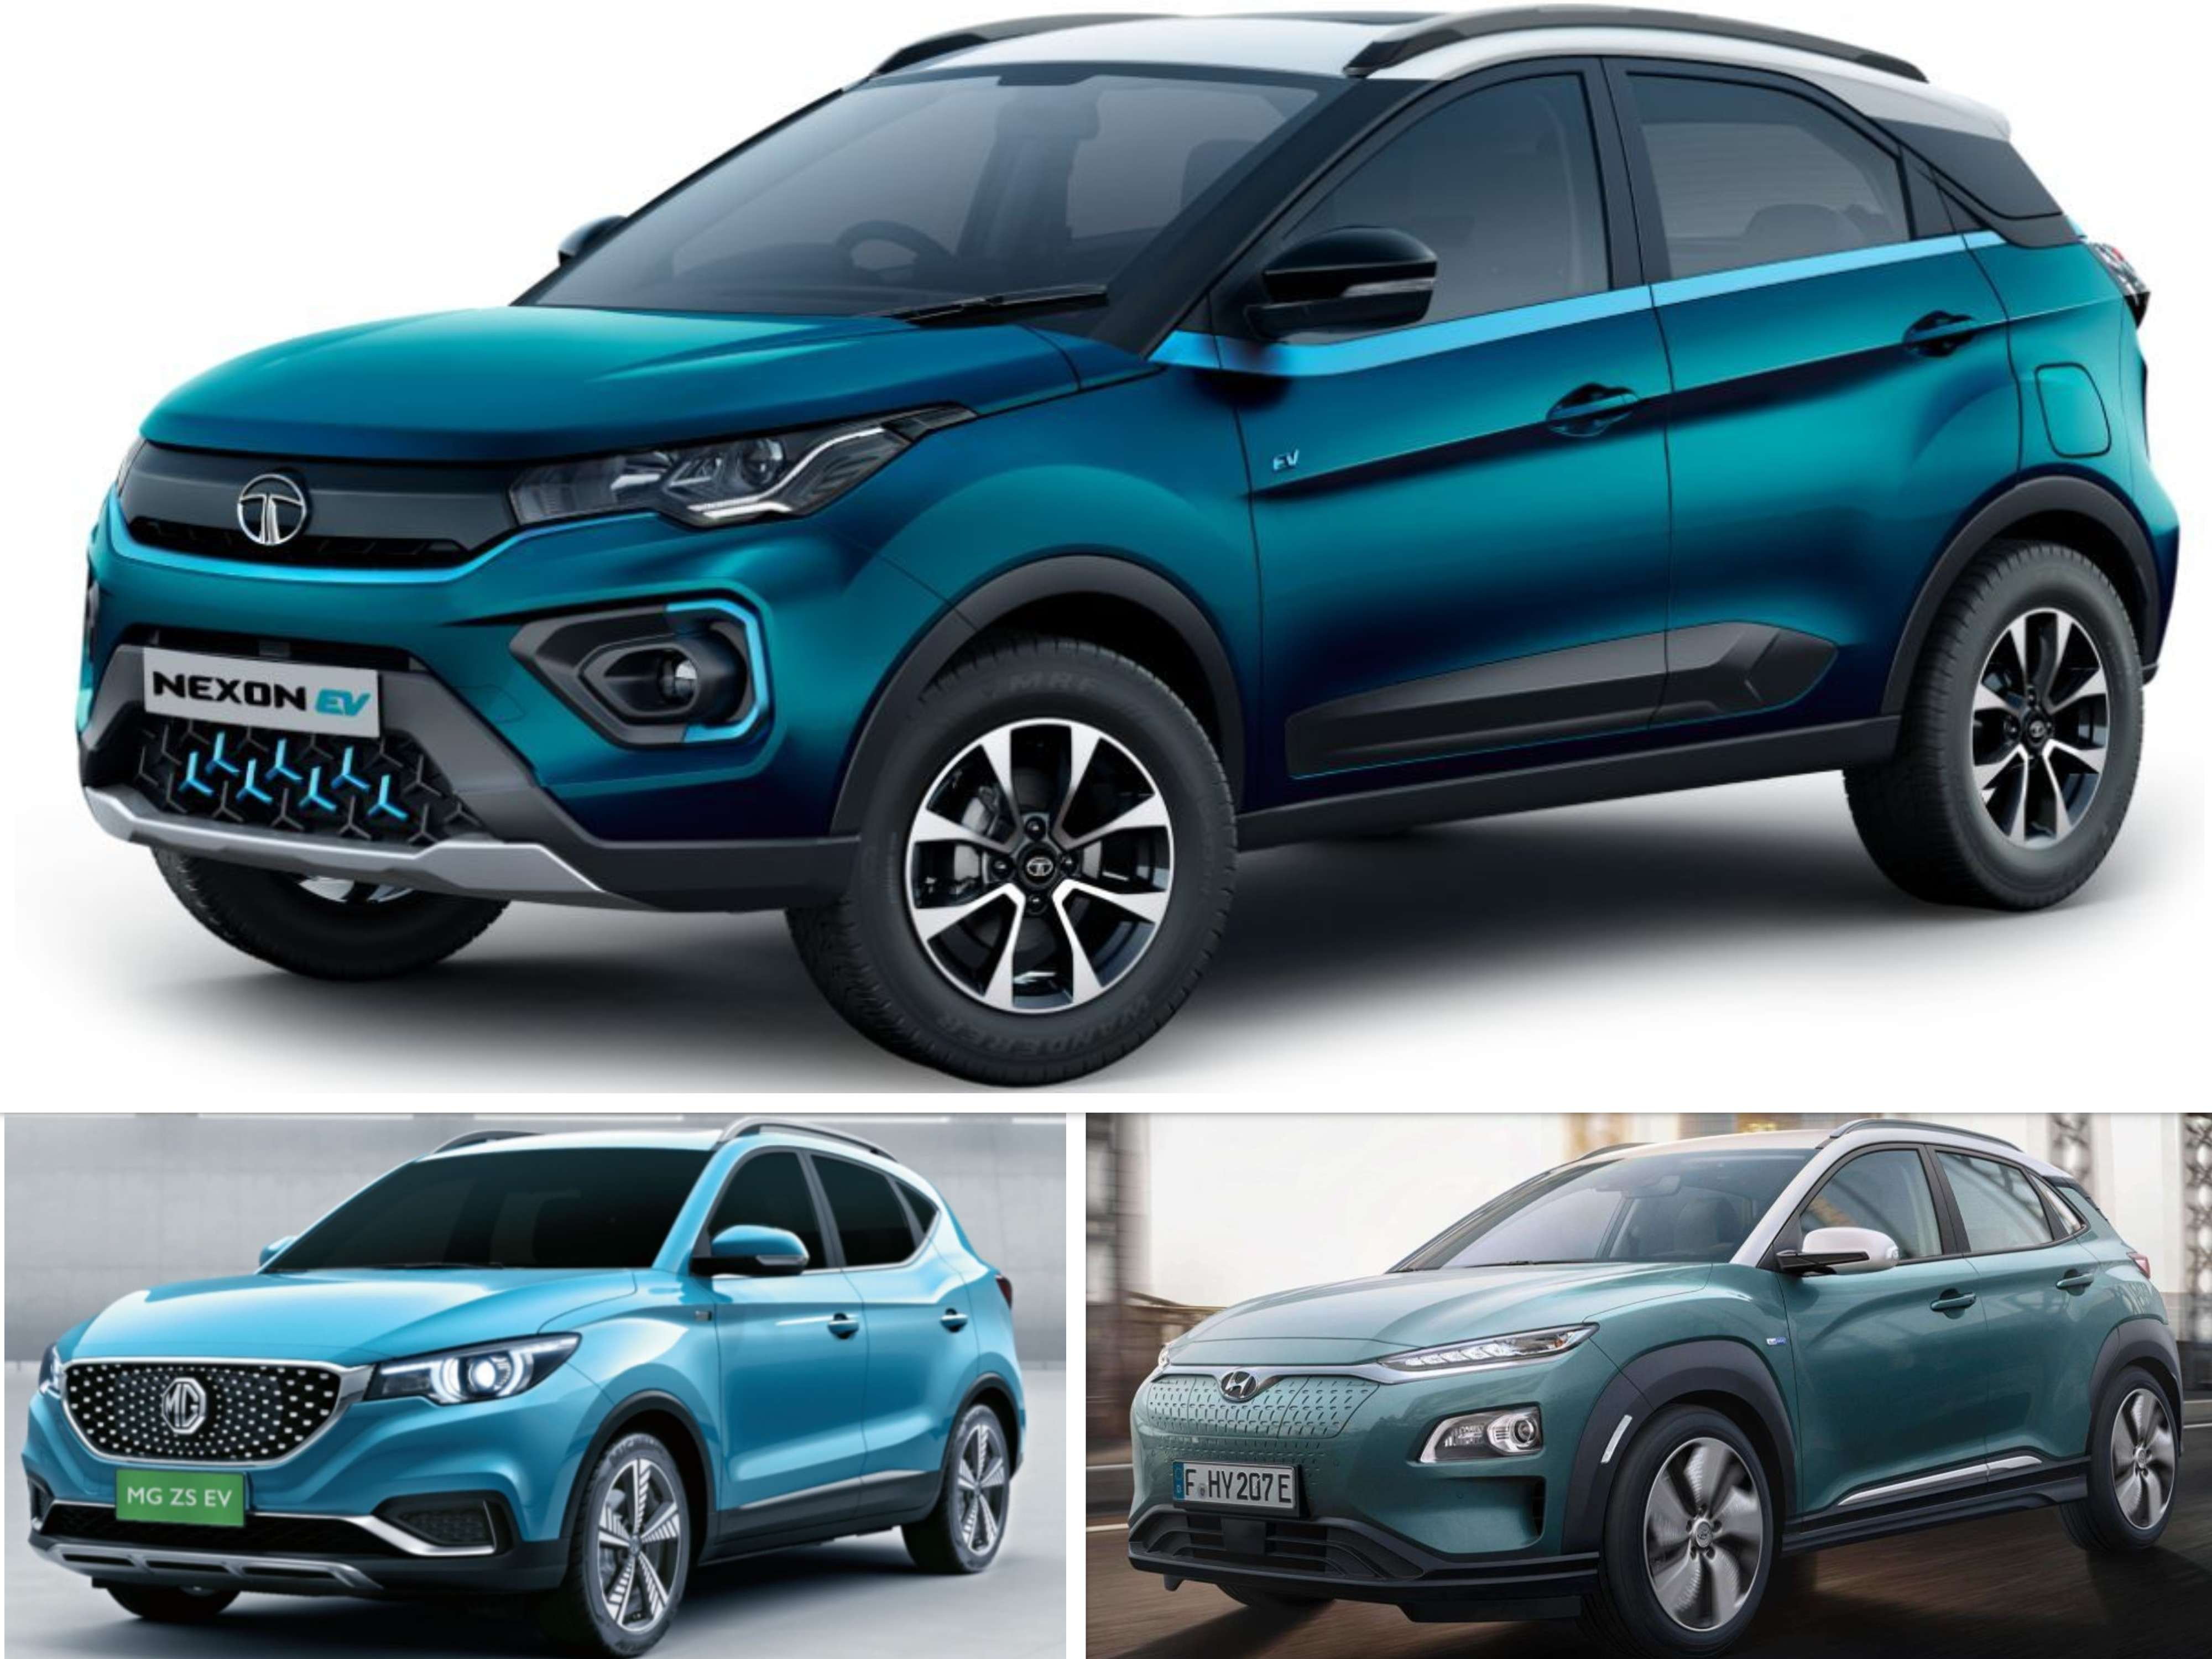 Tata Nexon Ev Tata Nexon Ev Vs Mg Zs Ev Vs Hyundai Kona Ev Specs Comparison Auto News Et Auto